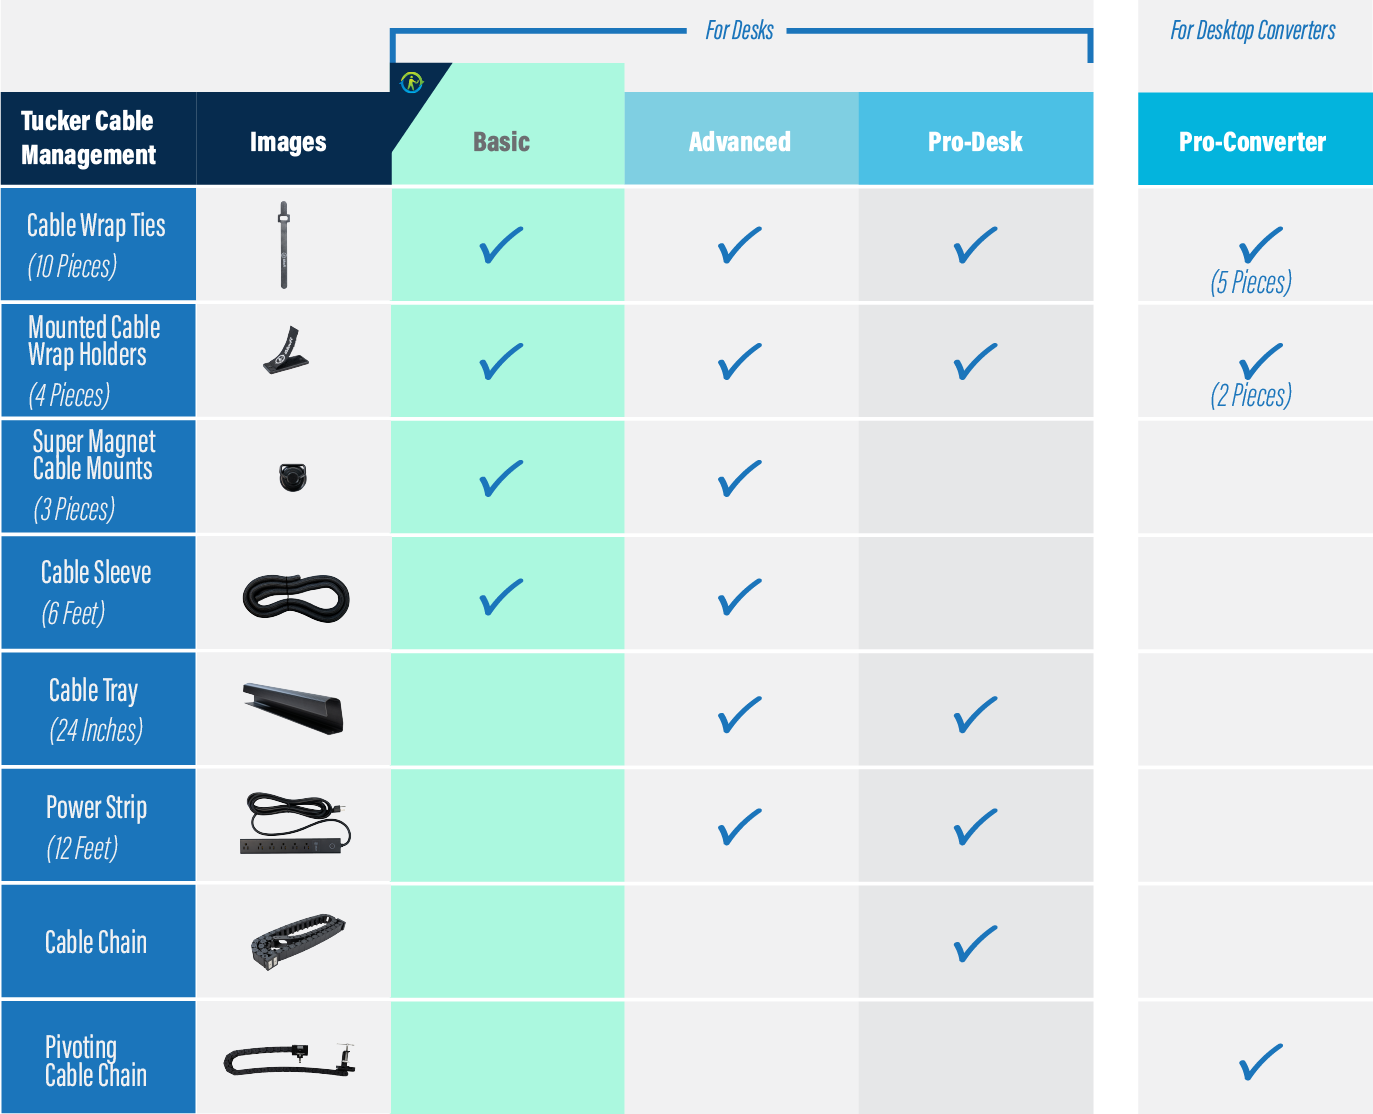 Tucker_Cable_Management_Kit_Comparison_Chart__Basic_